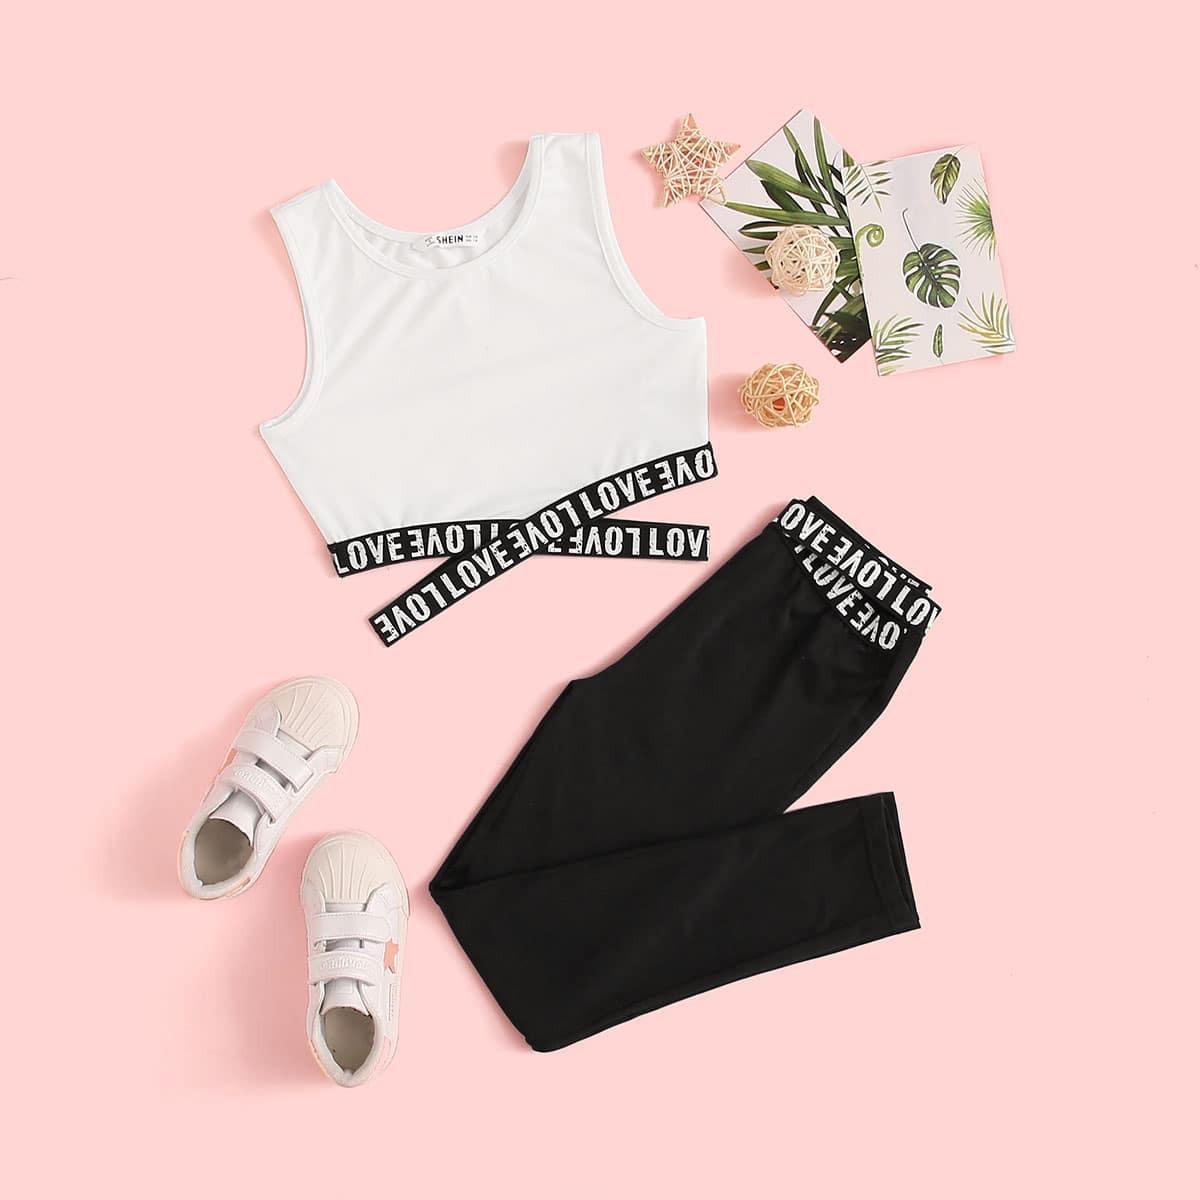 SHEIN / Conjunto de niñas tank top bajo con tiras cruzadas con estampado de letra con leggings